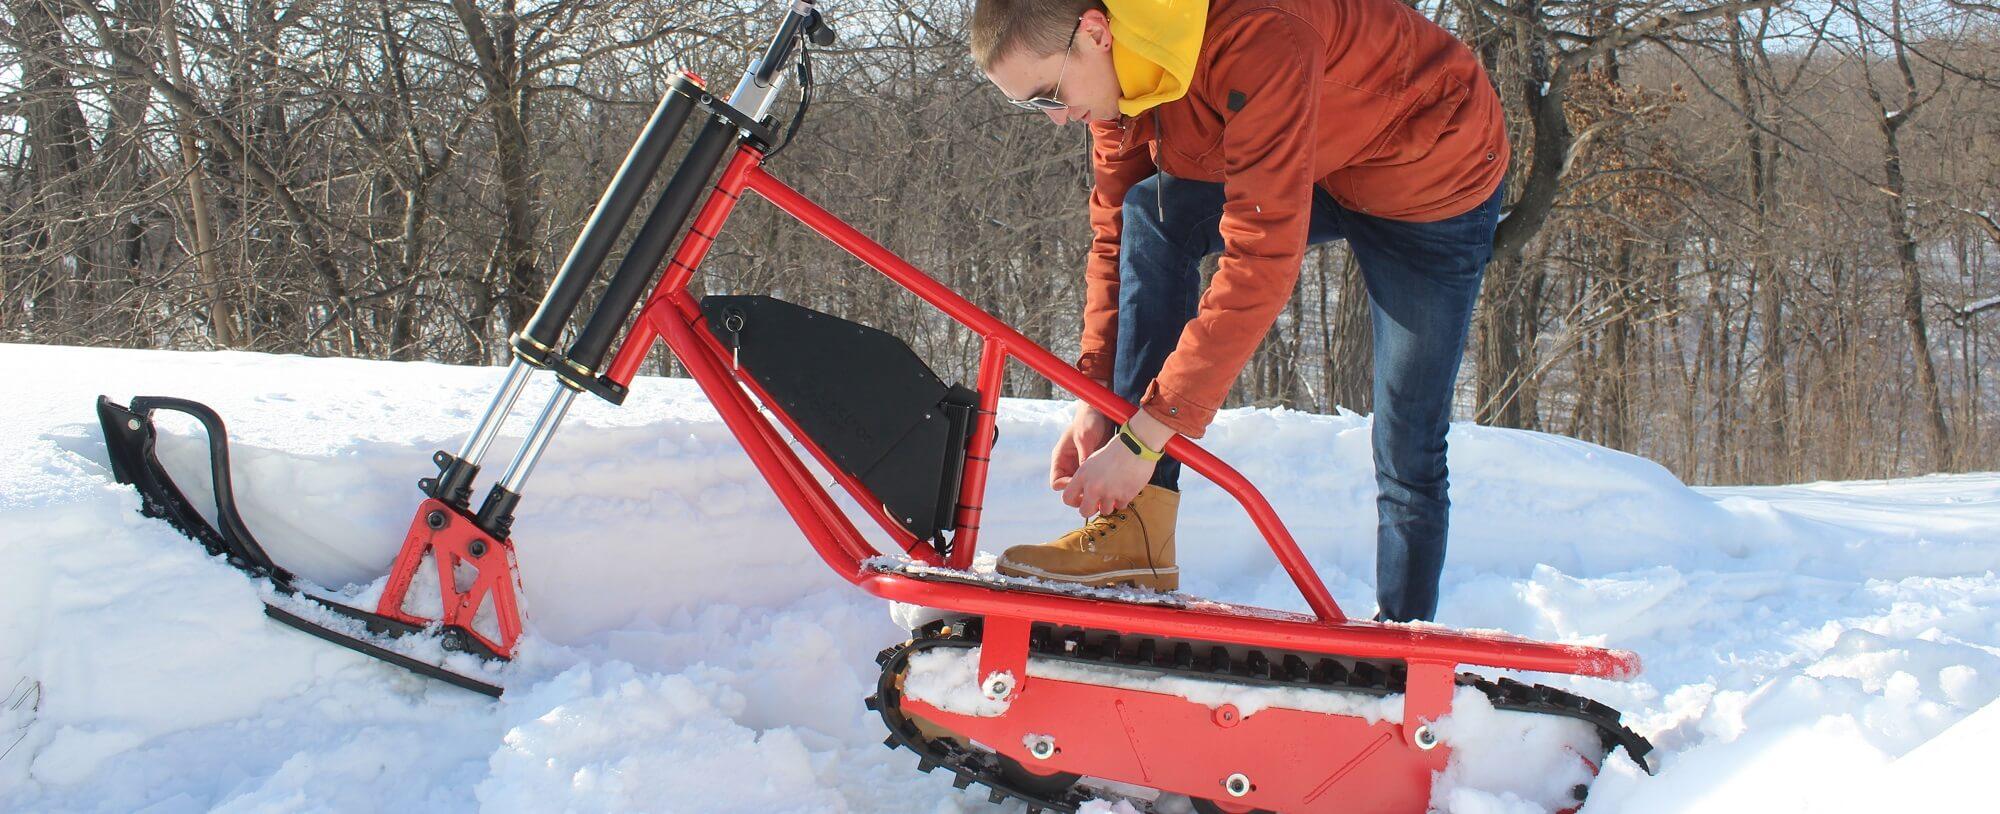 Elecrtric-snowbike_slider_4